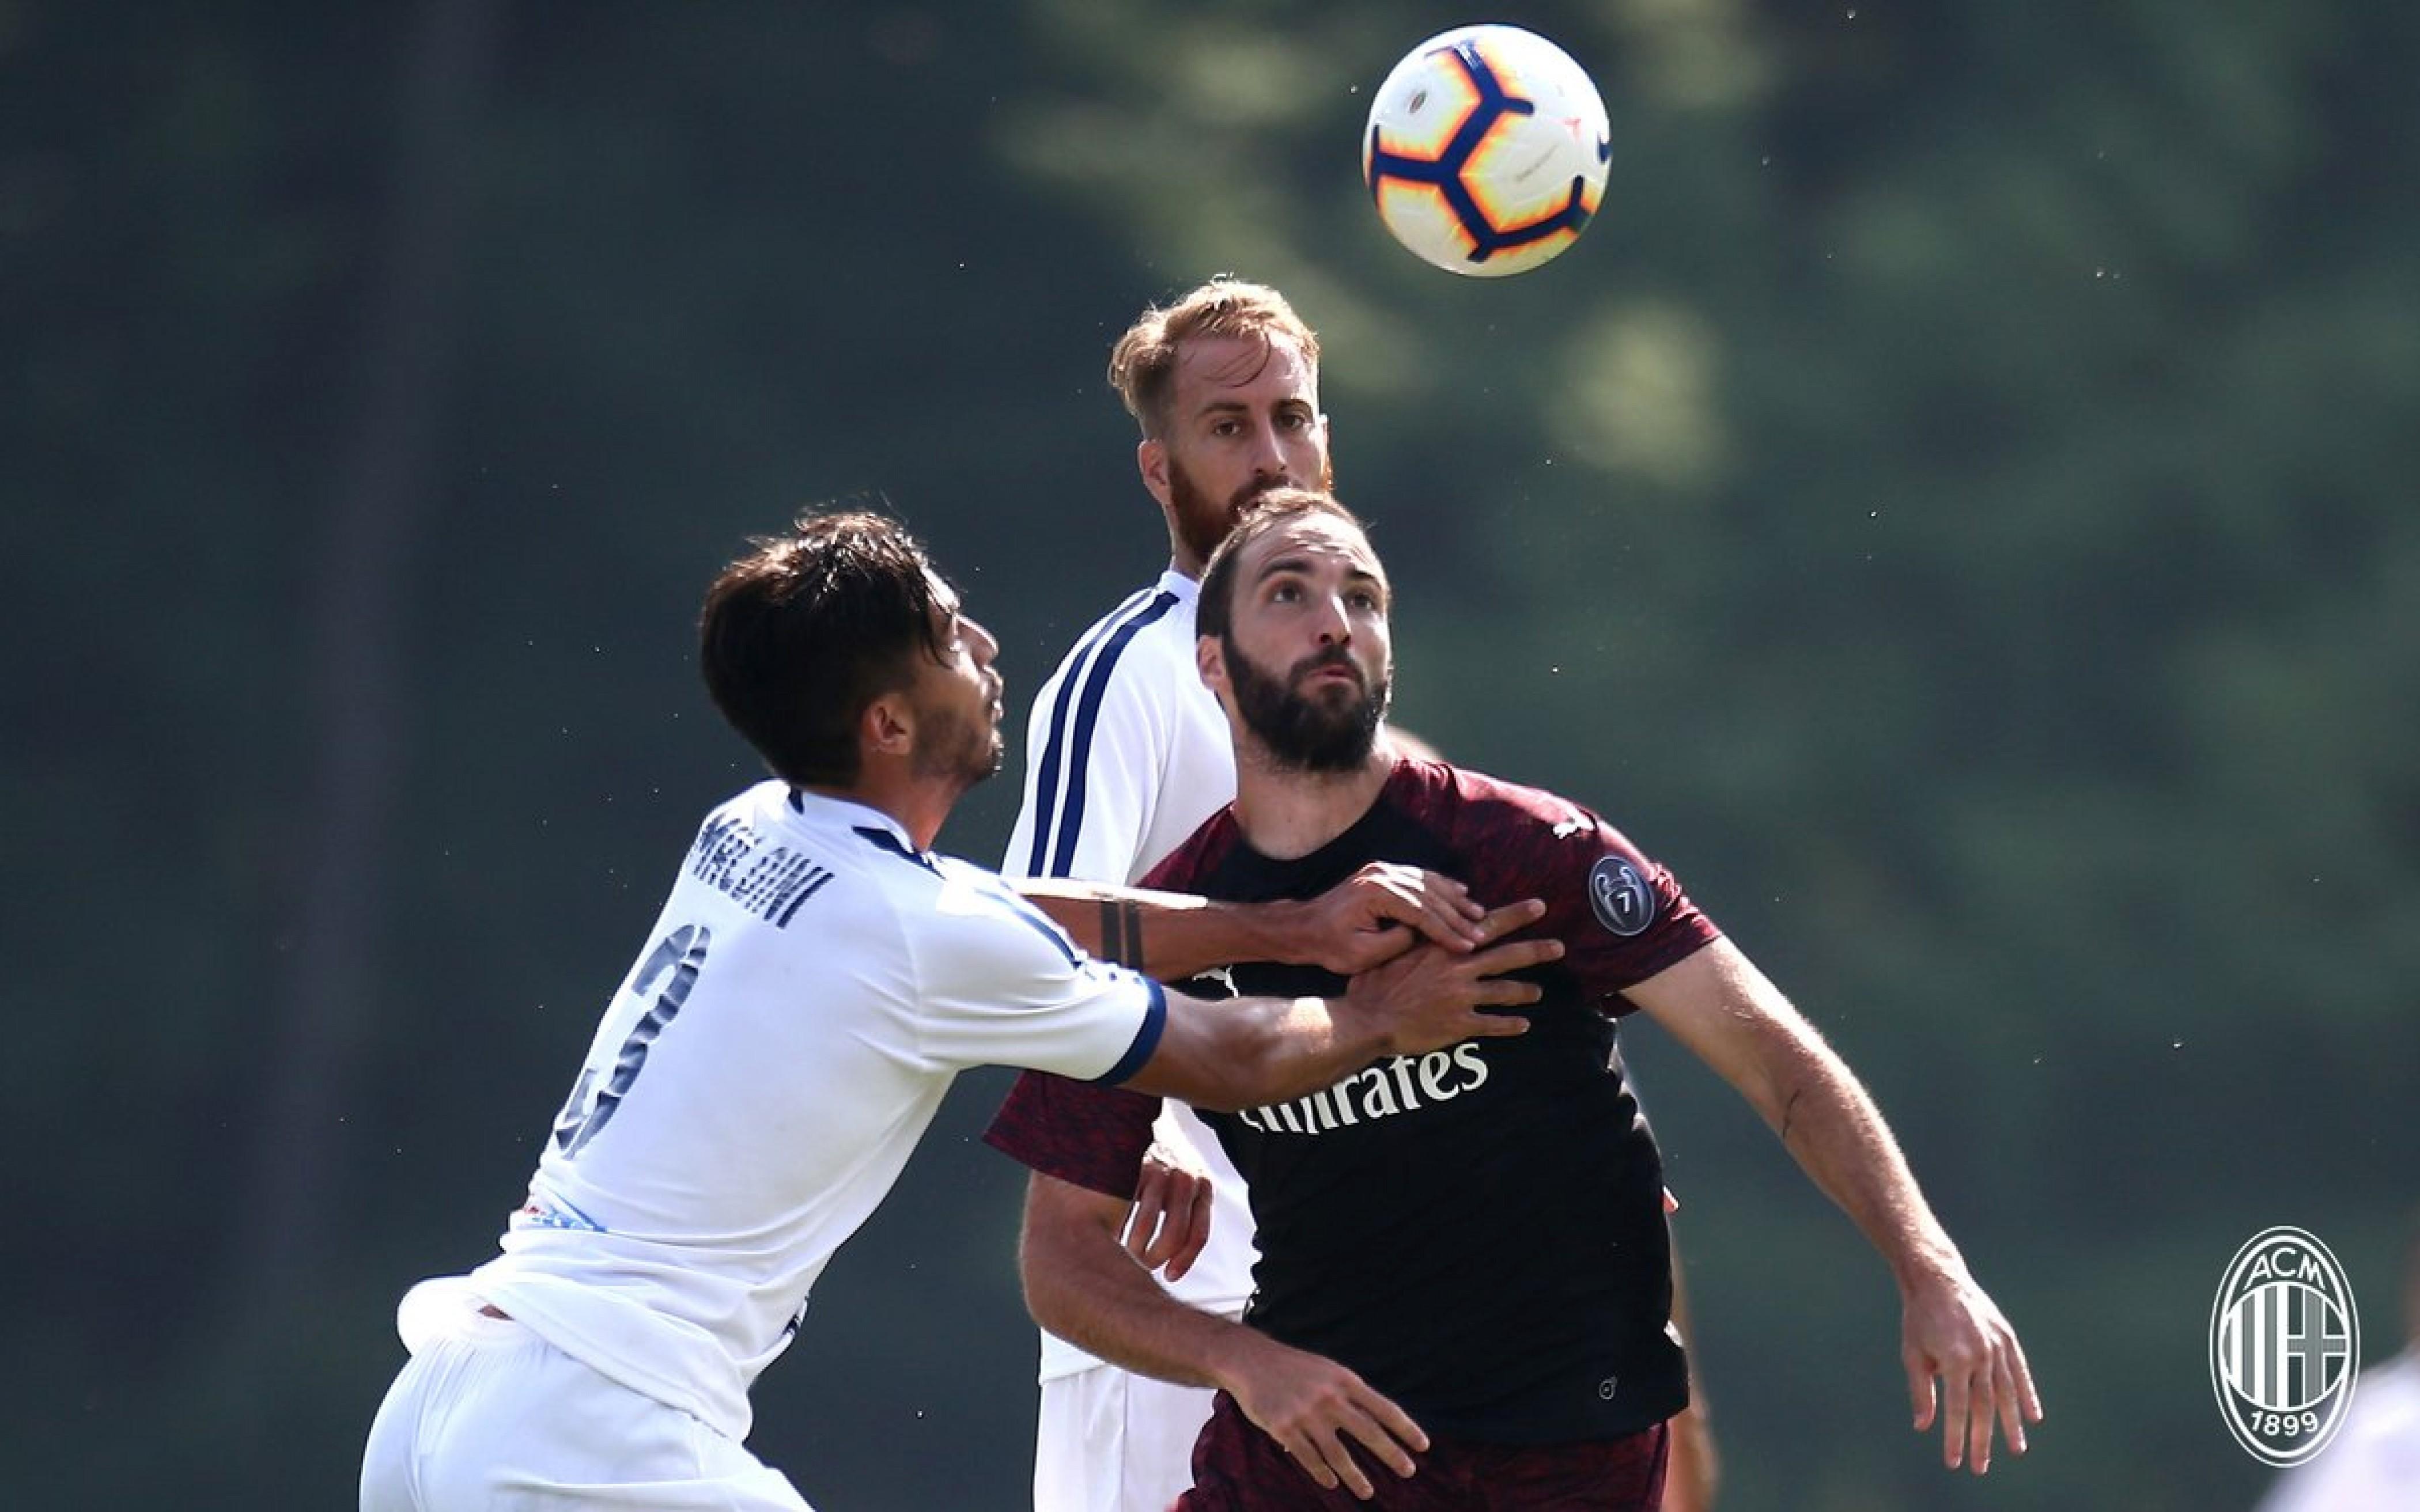 Milan, ieri vittoria in amichevole: bene Bakayoko e Castillejo